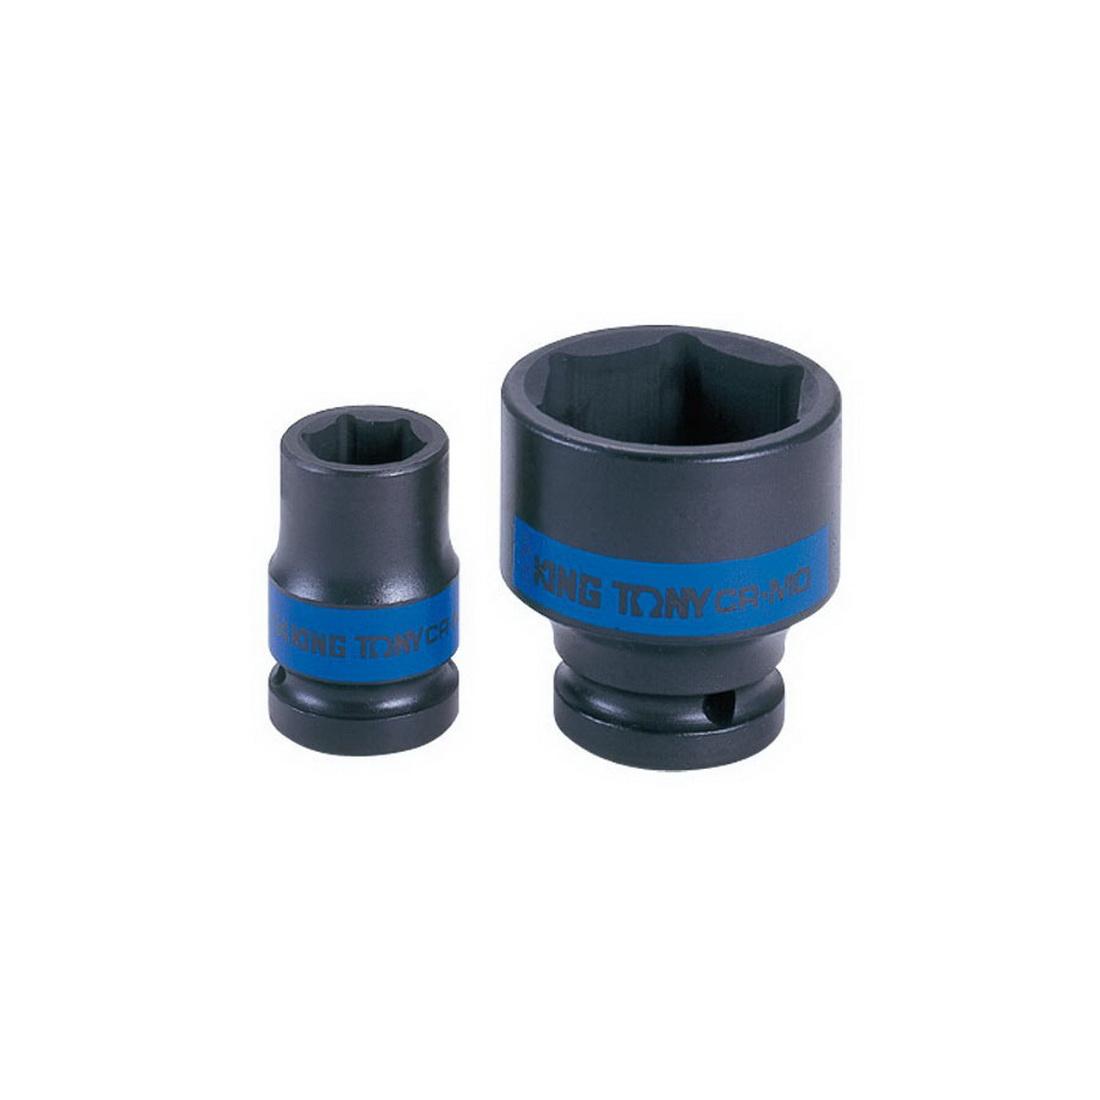 16mm 1/2 Inch Drive 6-Point Standard Impact Socket